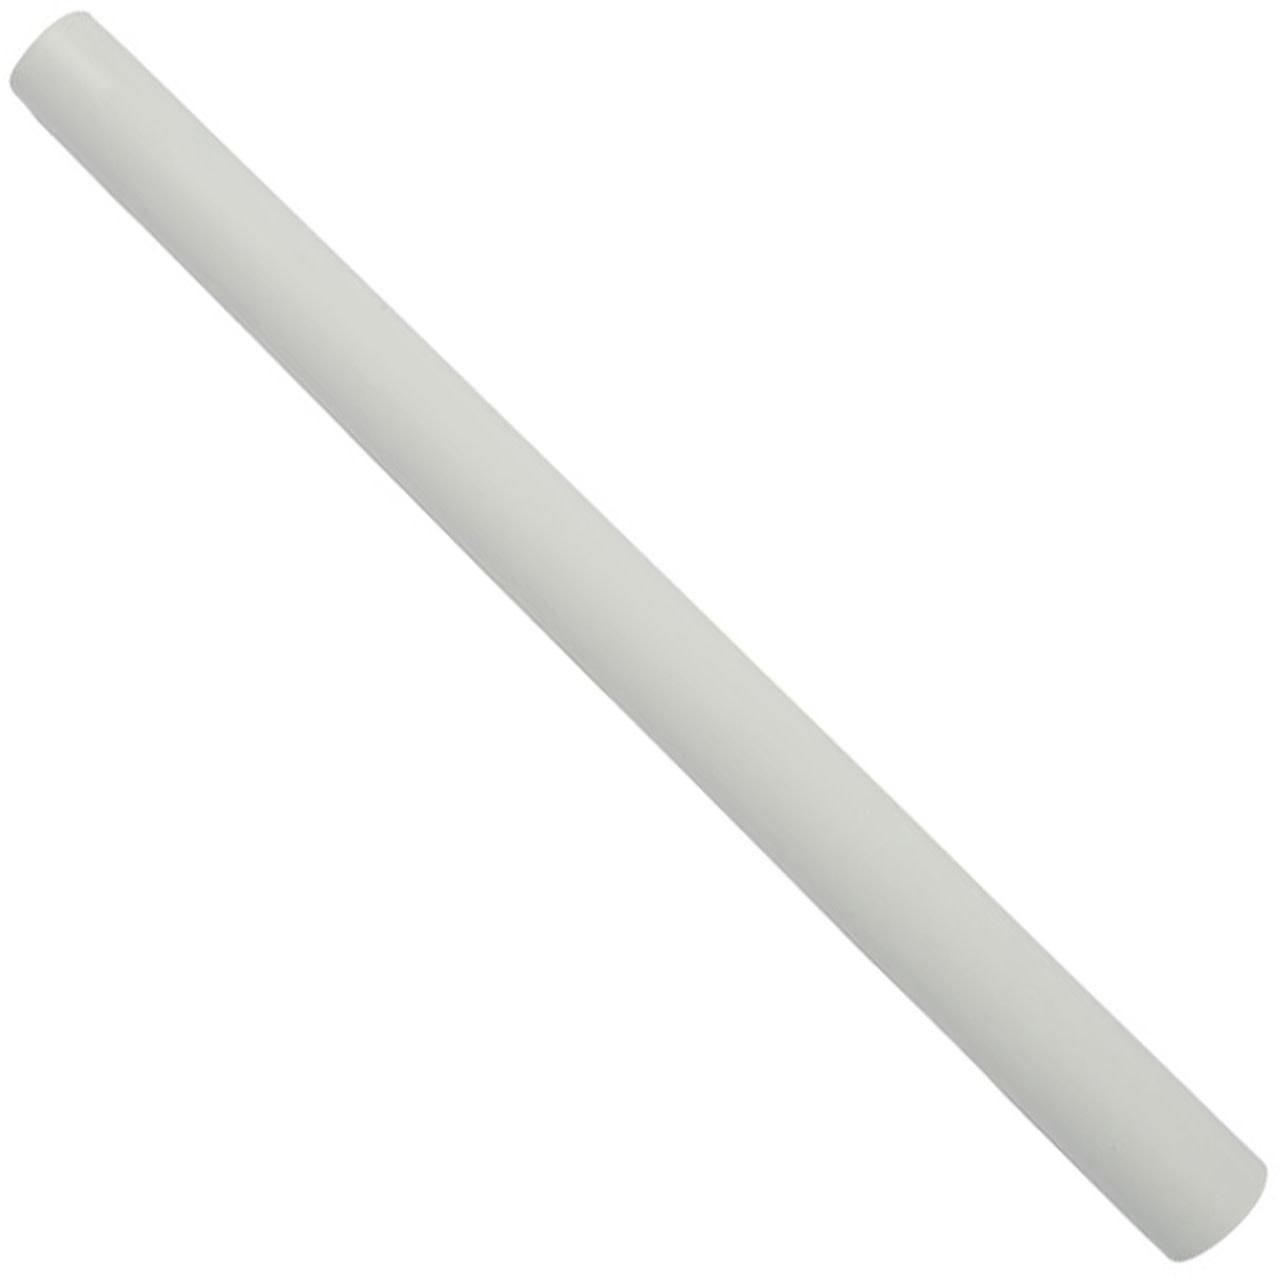 "Centec CenTec 32"" Plastic Wand - White"